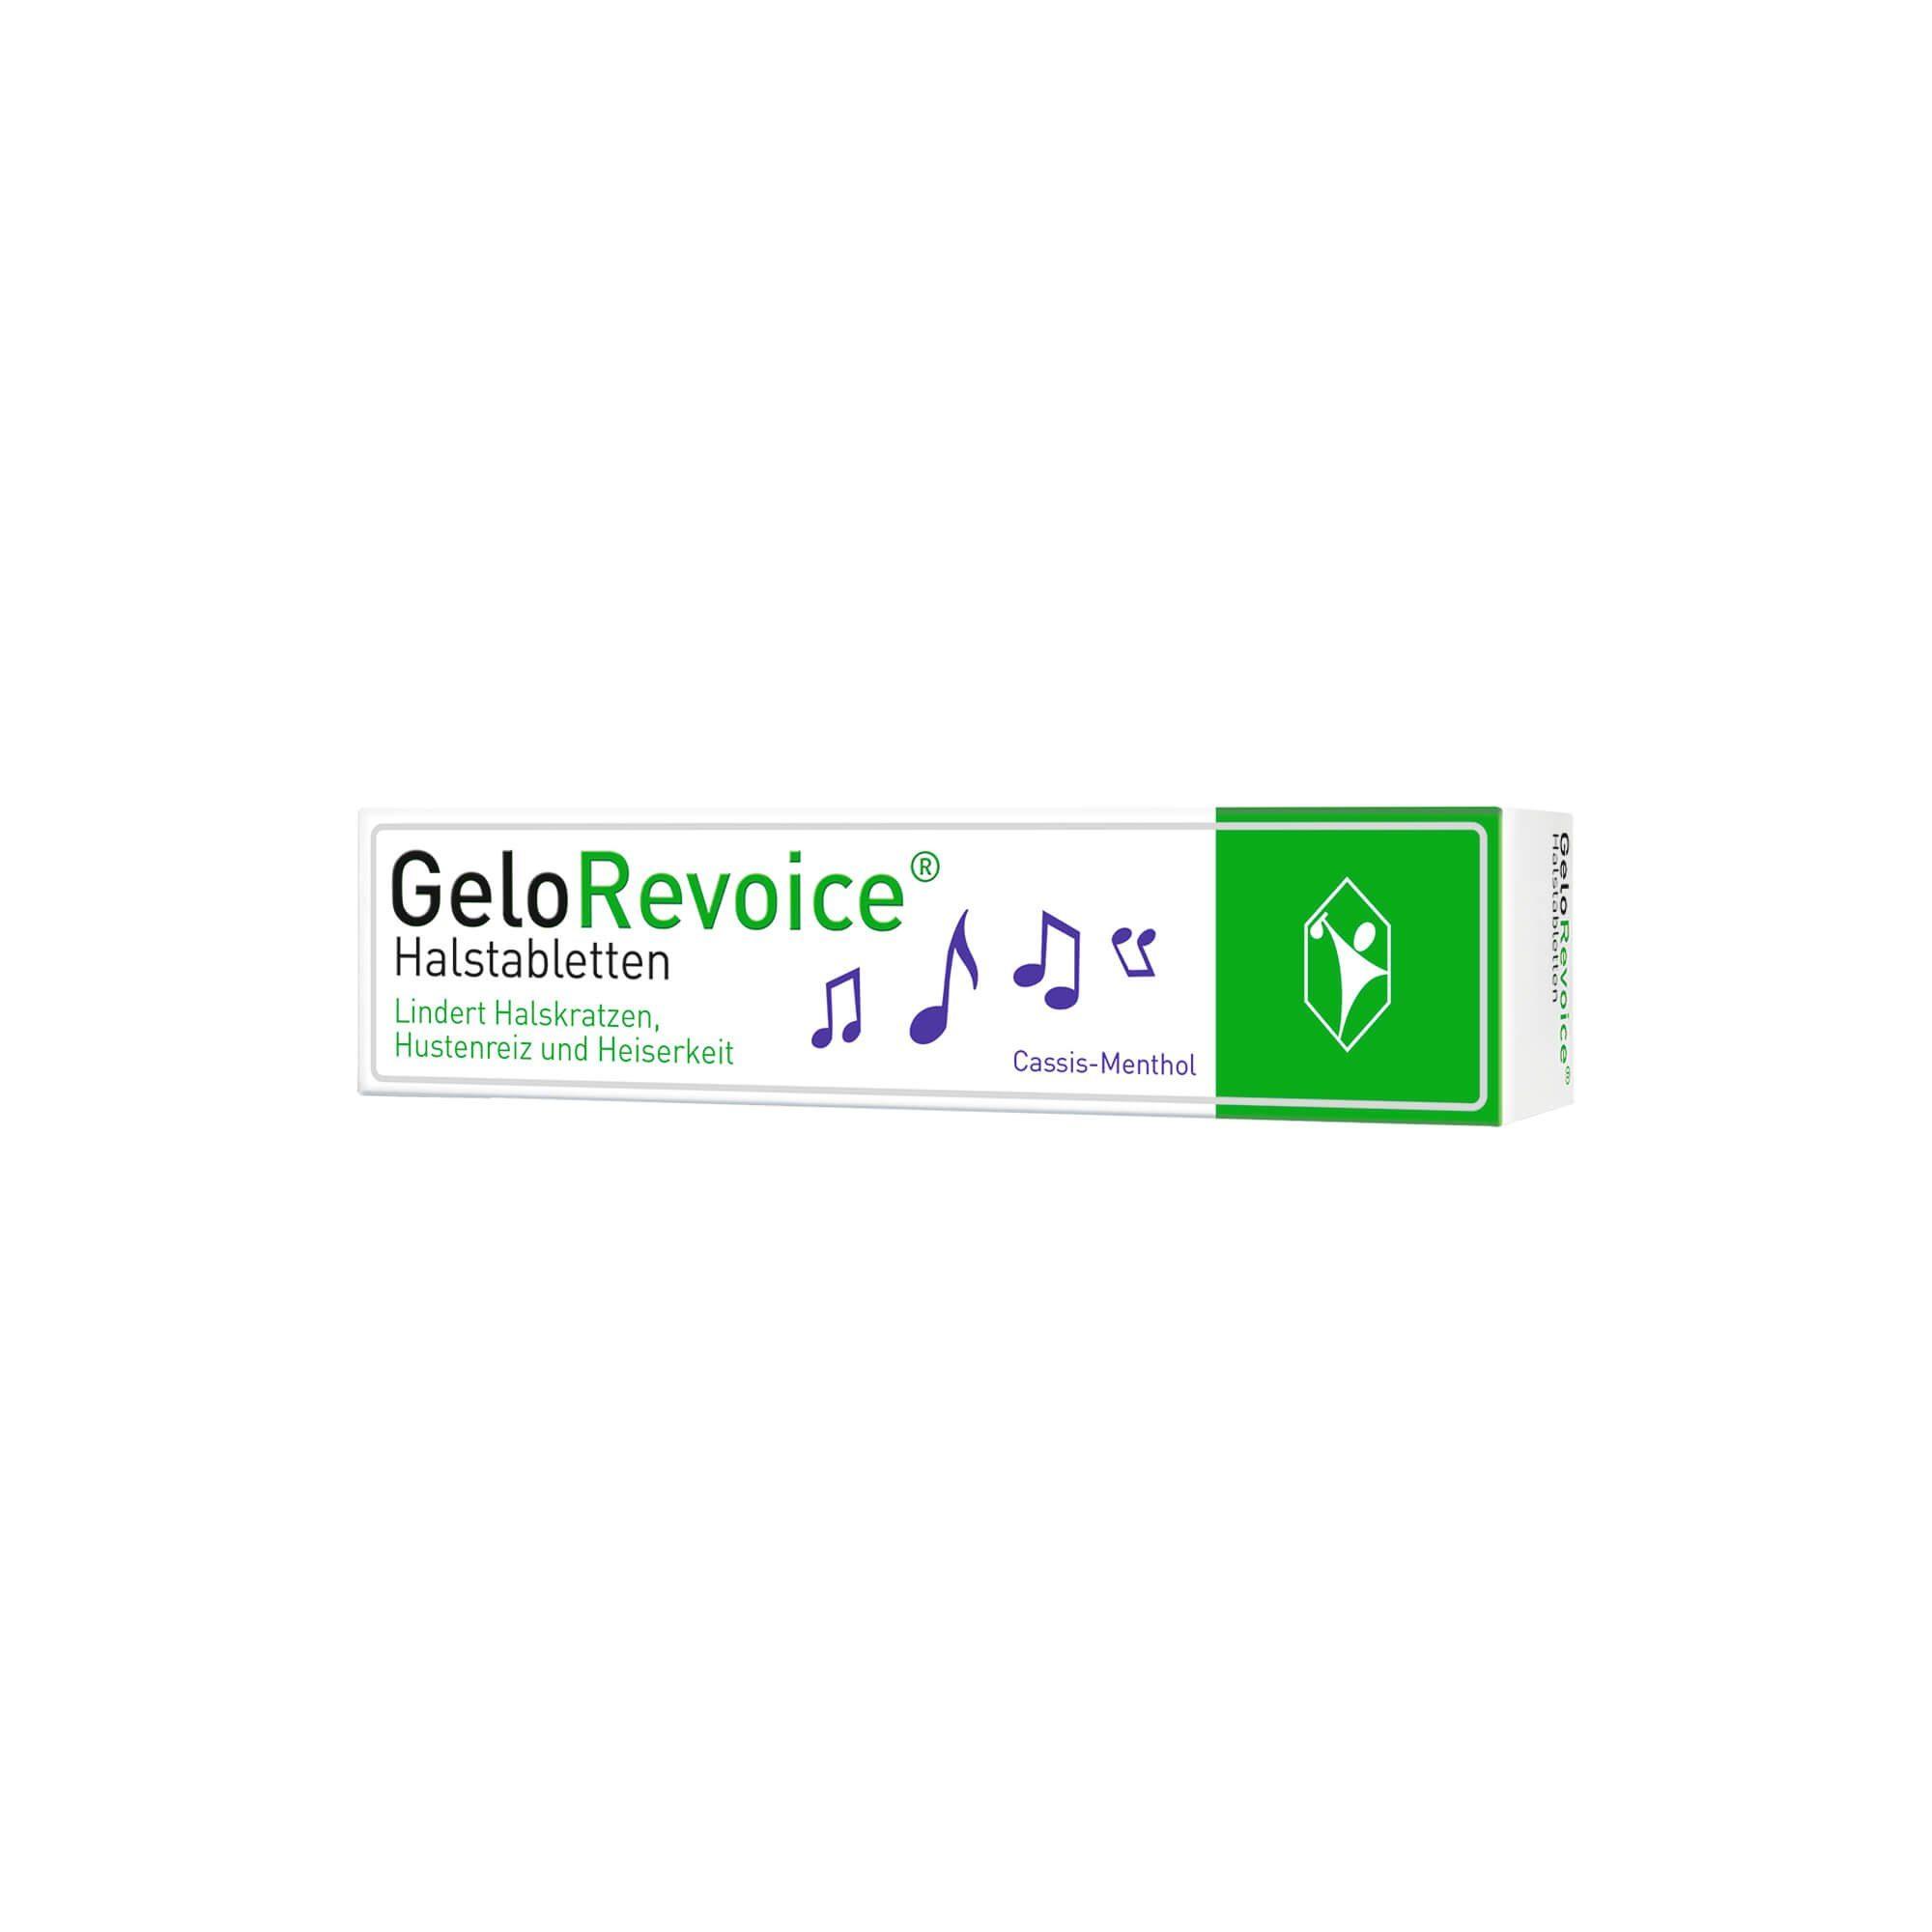 GeloRevoice Halstabletten Cassis-Menthol, 20 St